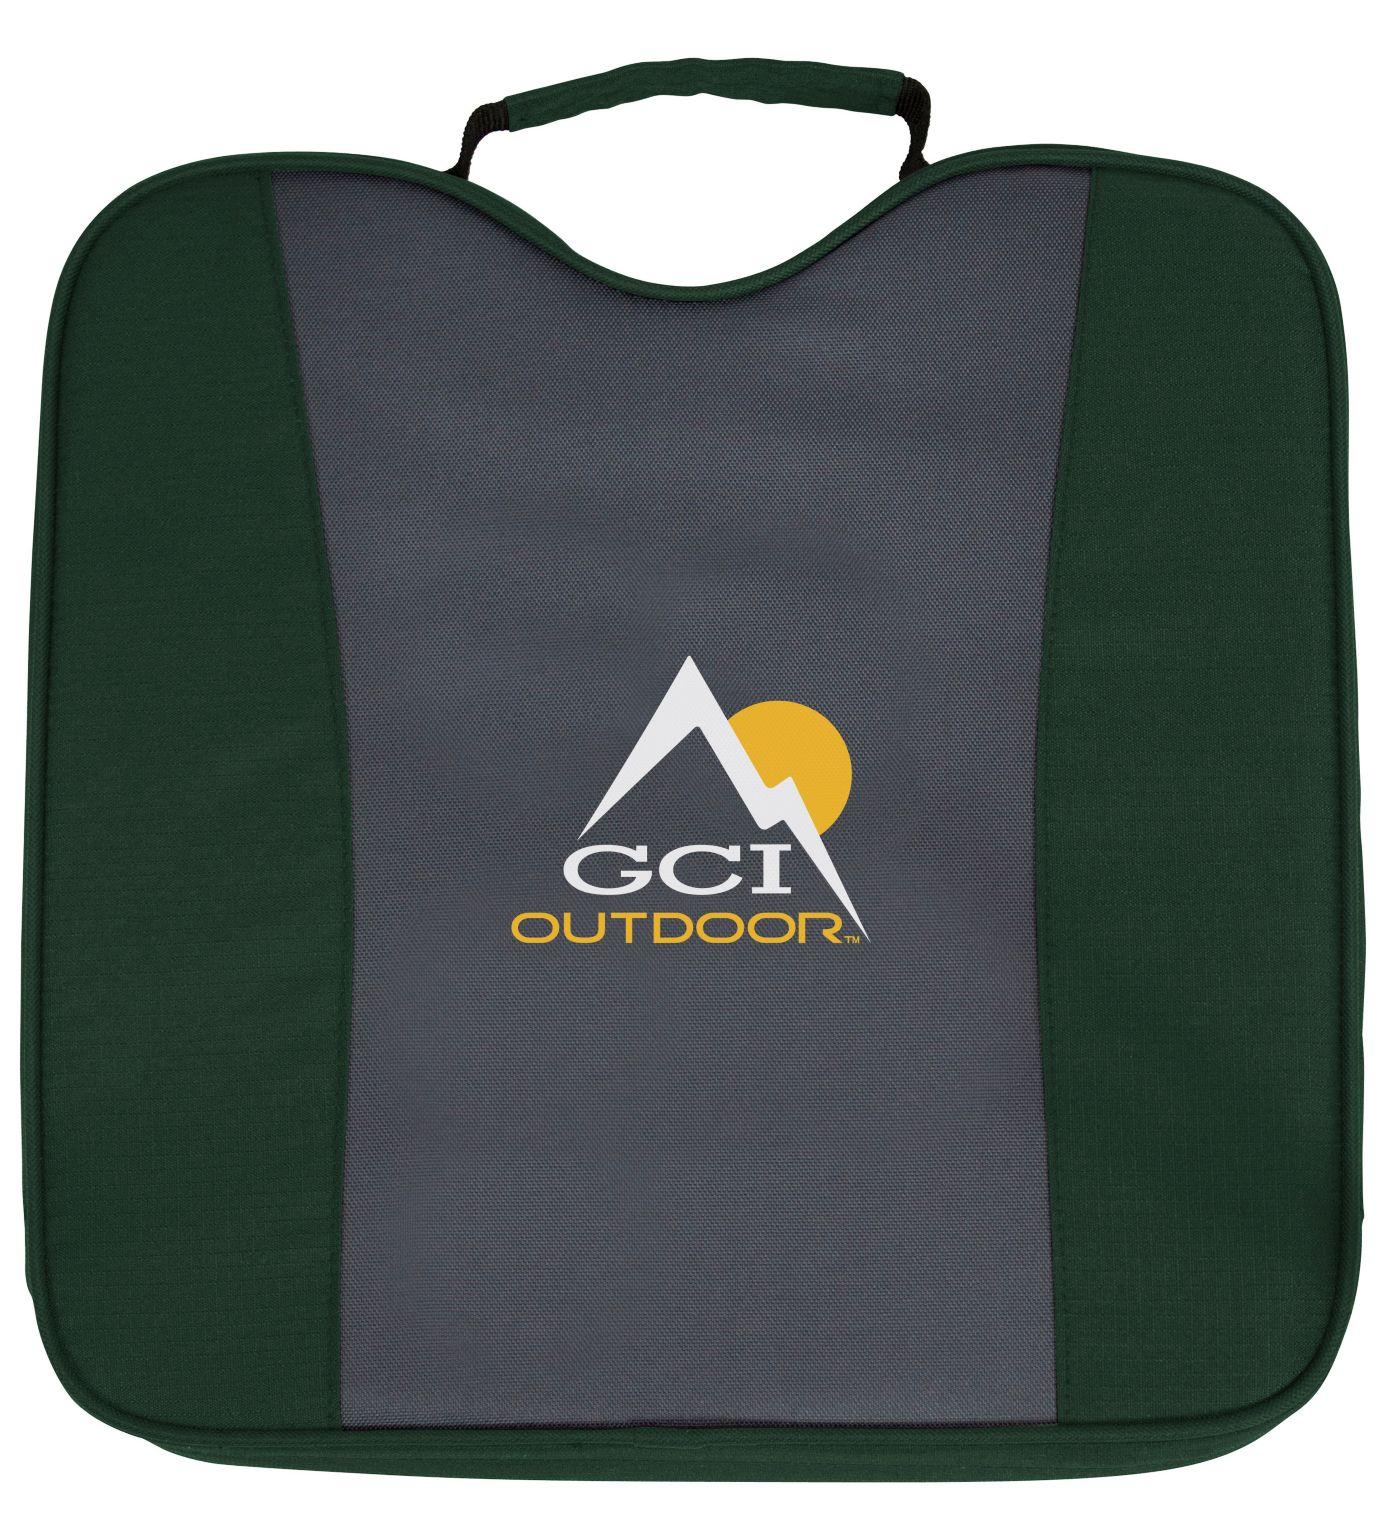 GCI Outdoor Comfort Cushion